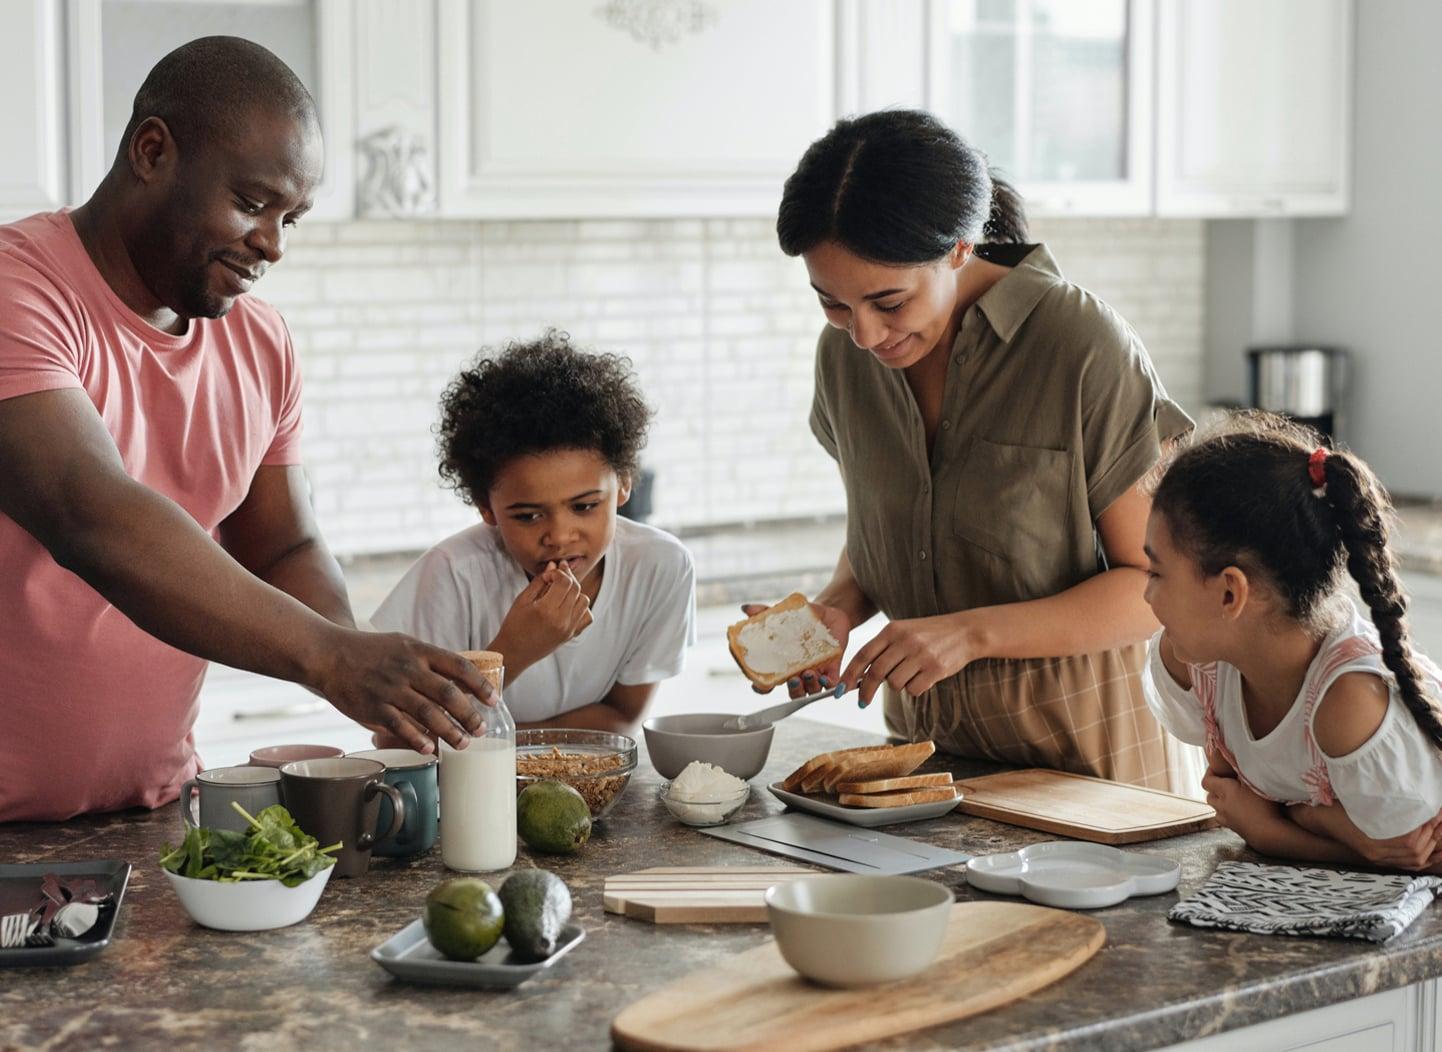 Family making breakfast in a kitchen